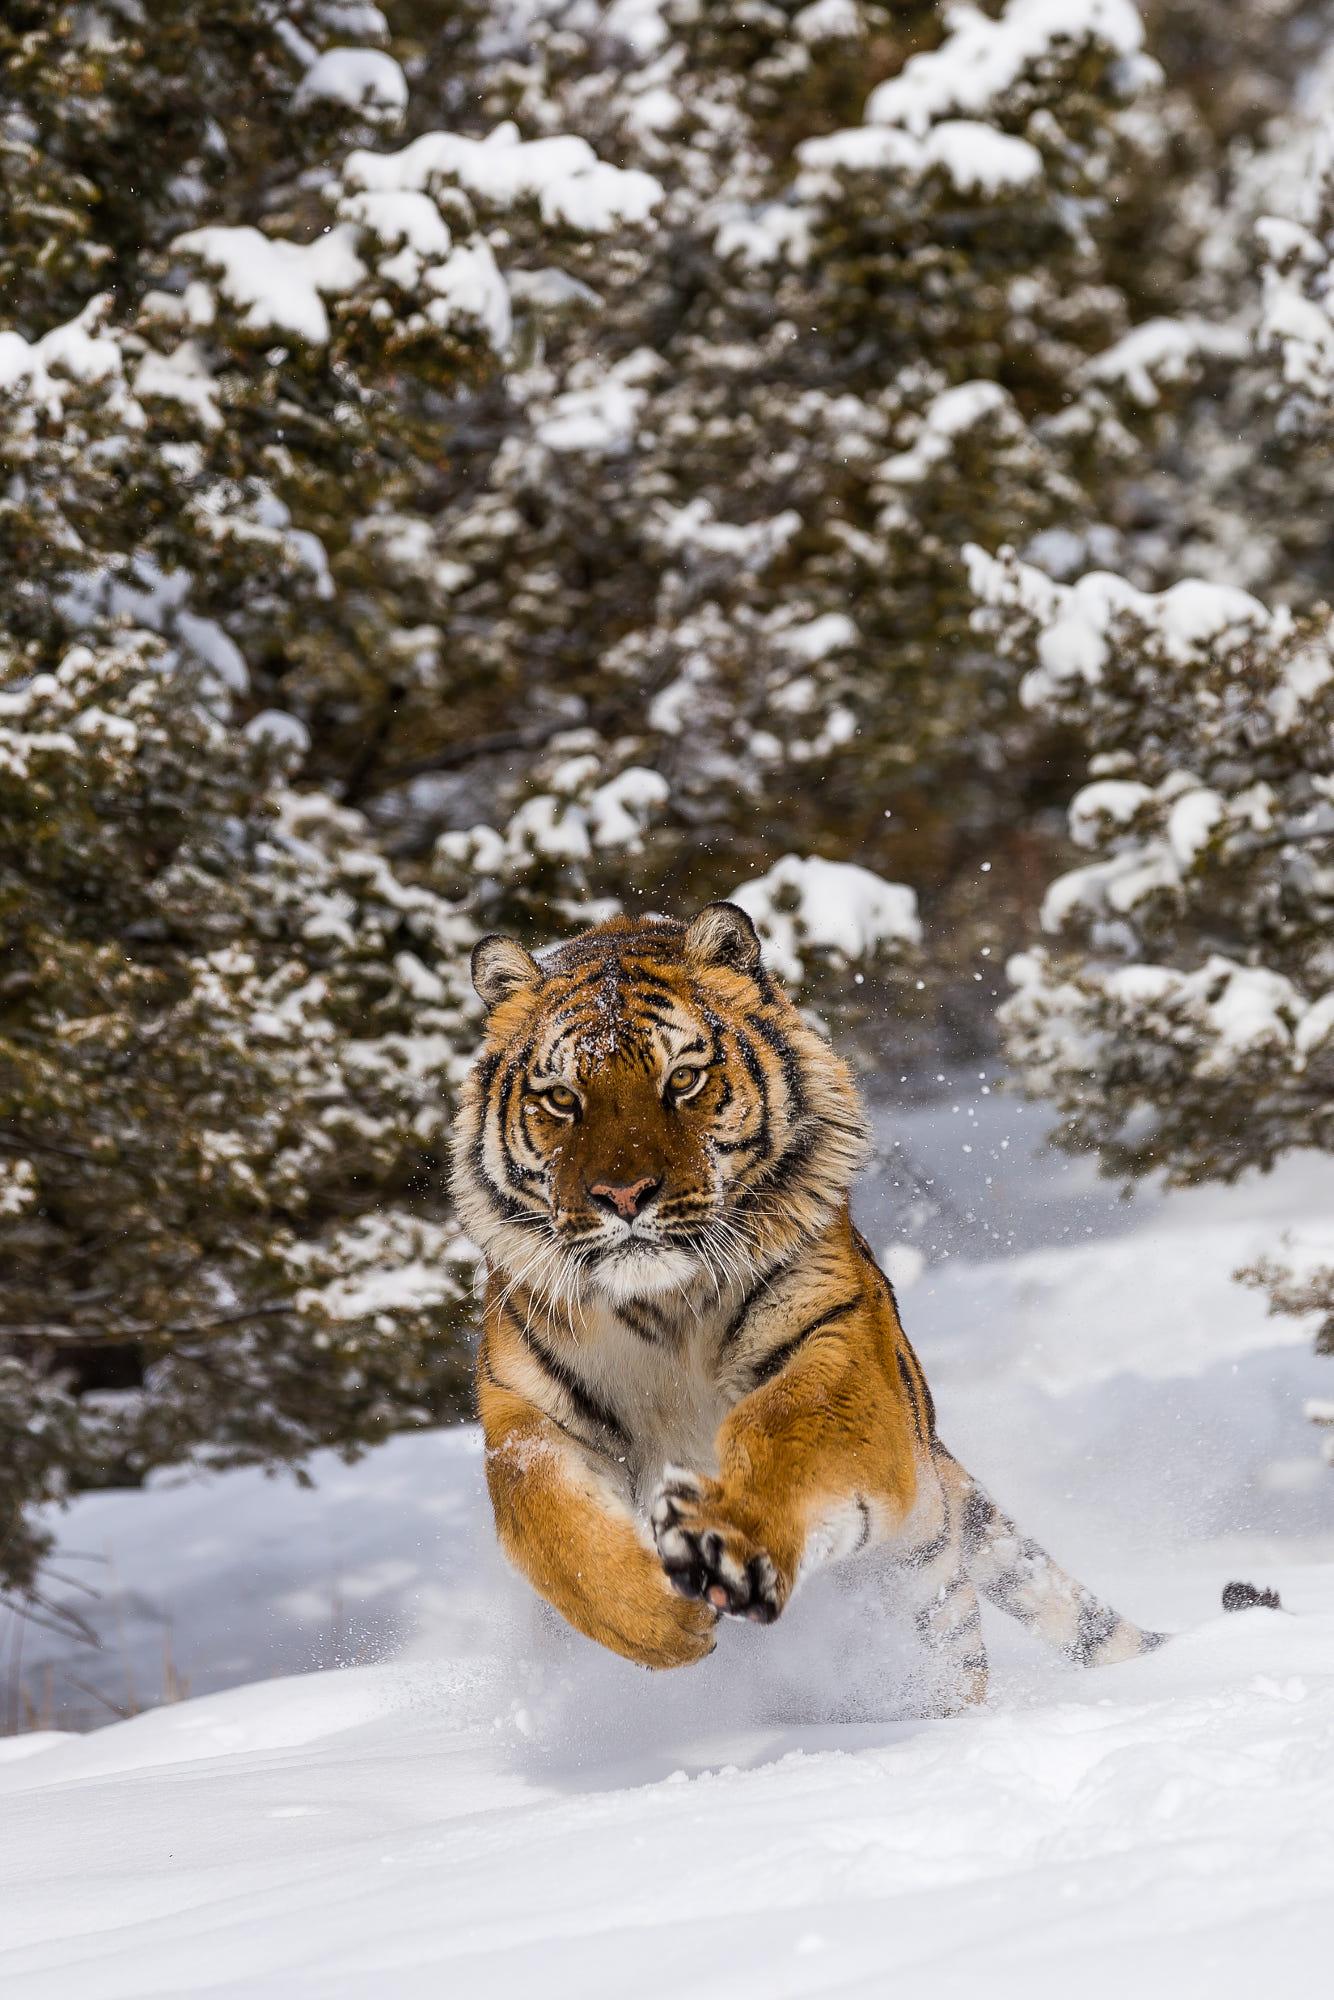 Tiger jumping in snow (panthera tigris) by Christophe ...